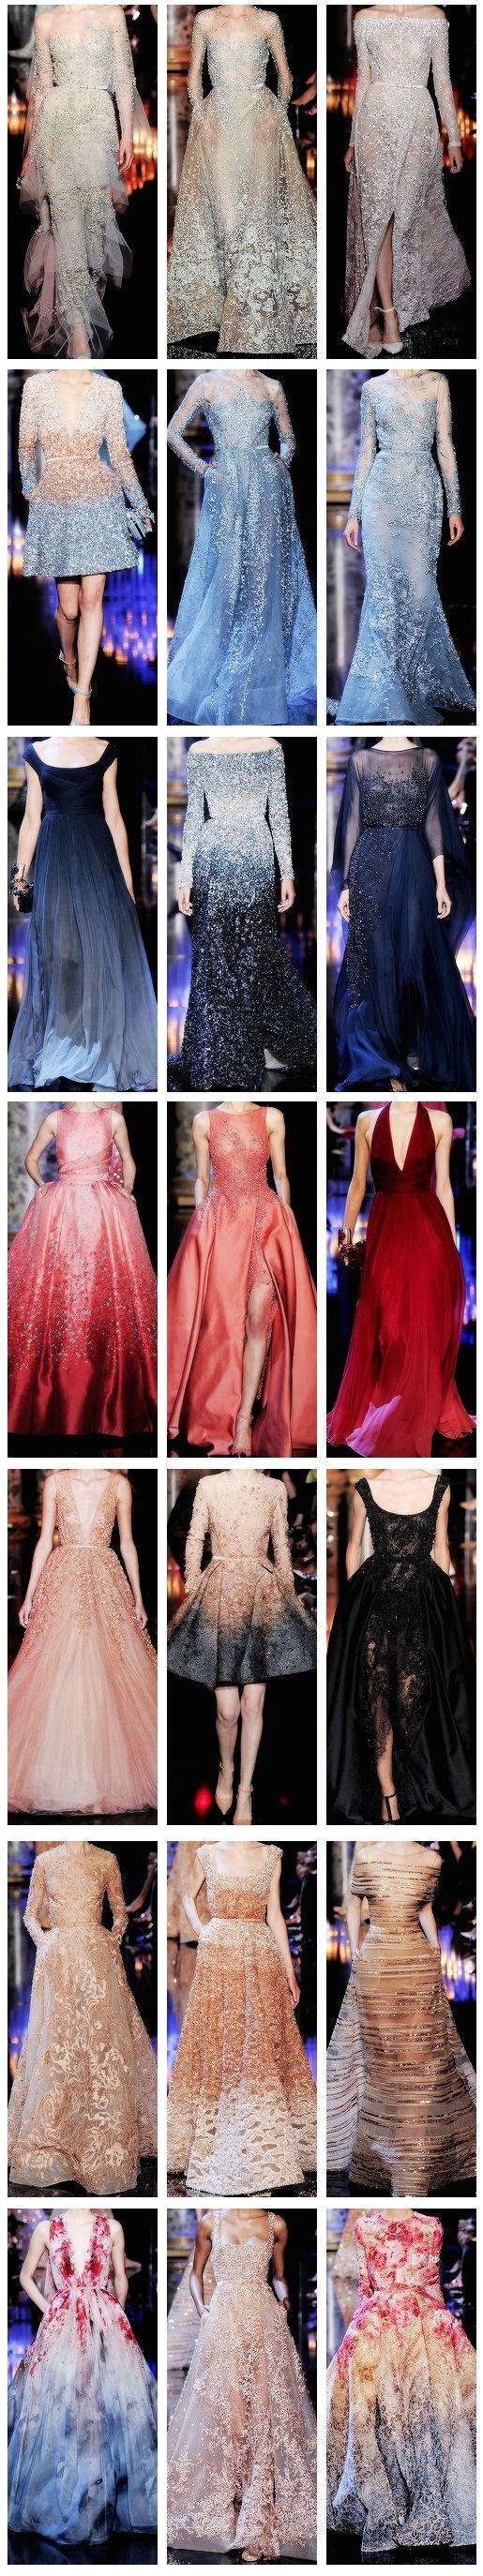 Elie Saab Haute Couture F/W 2014-2015 jαɢlαdy